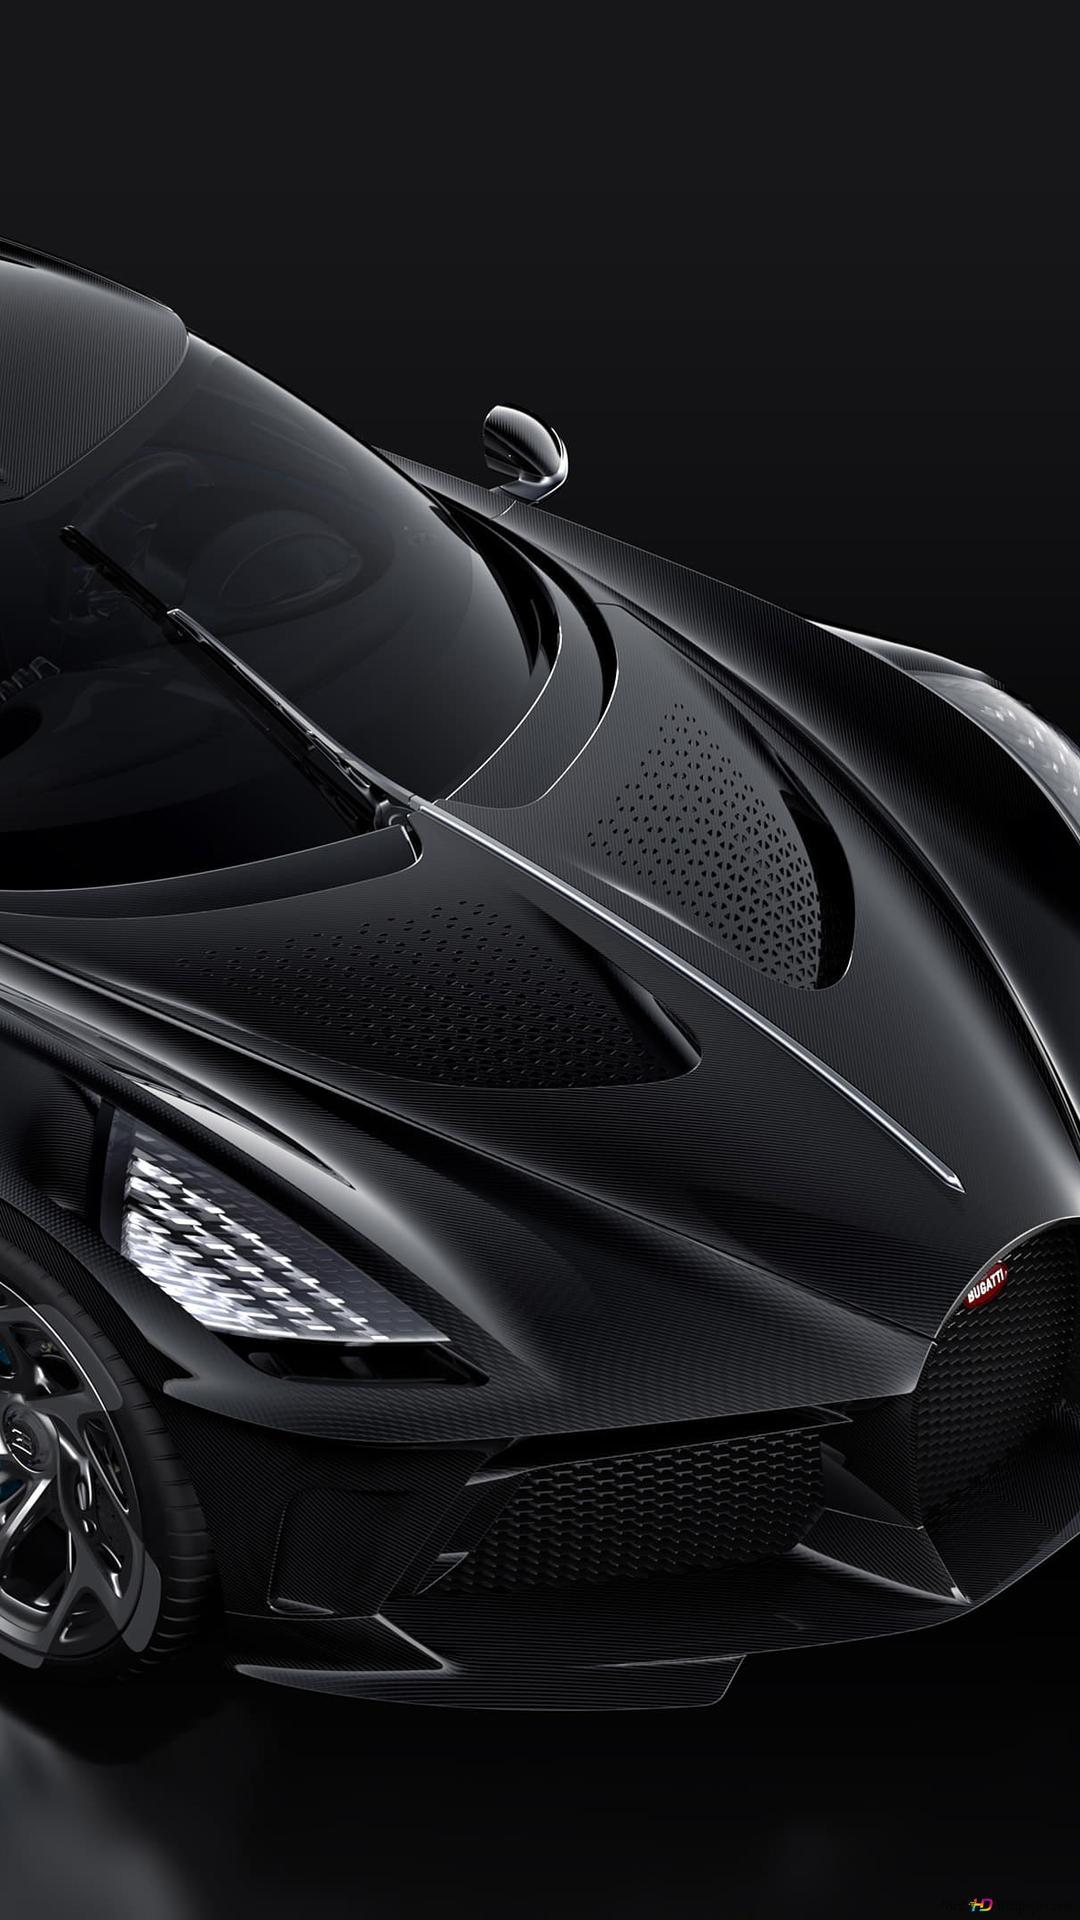 Descargar Fondo De Pantalla Bugatti La Voiture Noire Hd